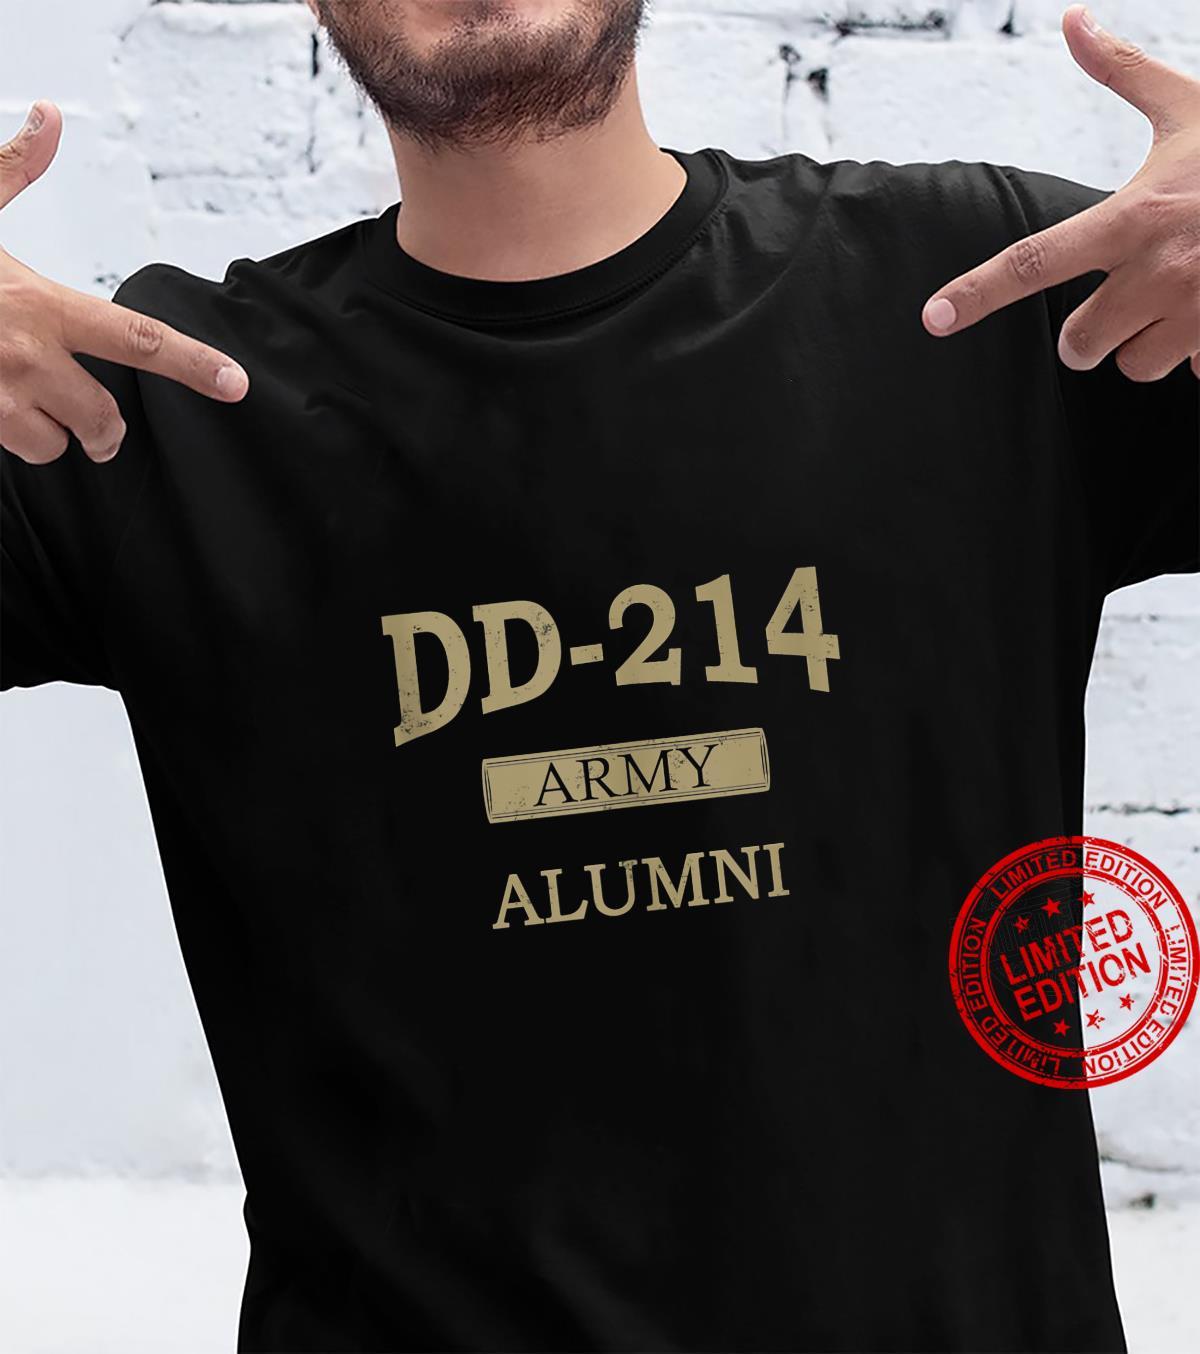 DD214 US Army Alumni Vintage Veteran Retired Military Shirt